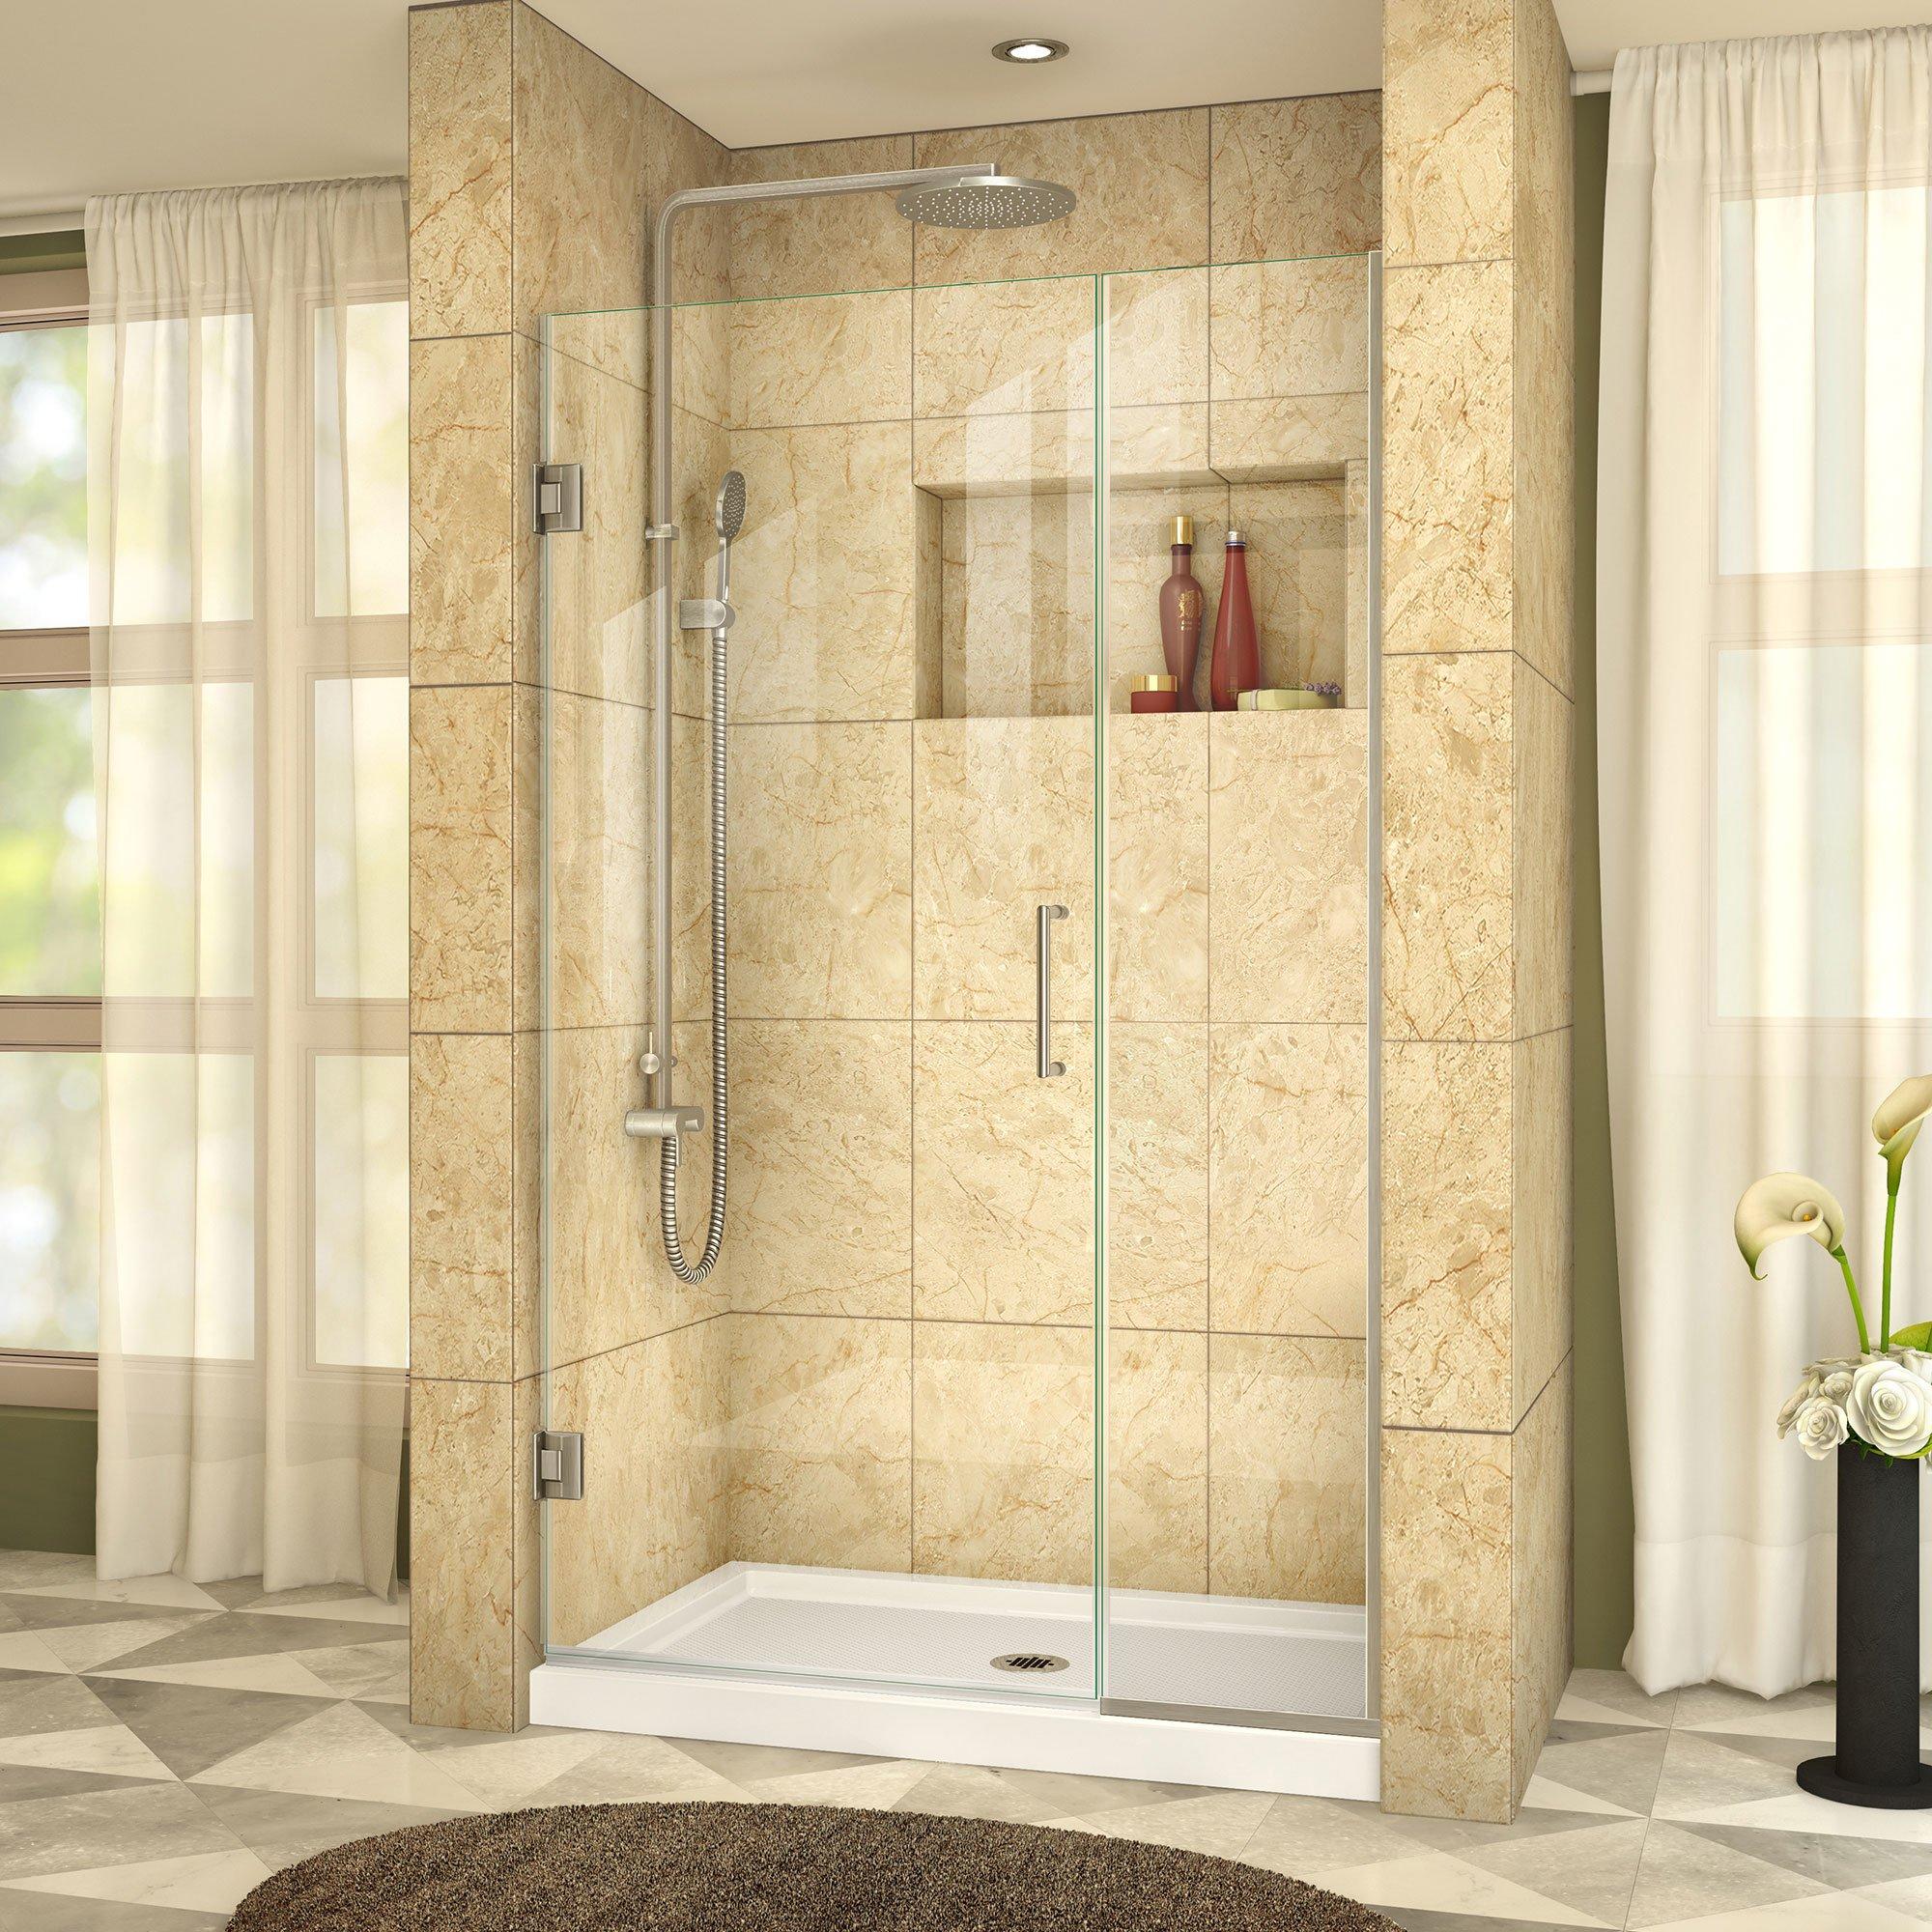 DreamLine Unidoor Plus 39 1/2-40 in. Width, Frameless Hinged Shower Door, 3/8'' Glass, Brushed Nickel Finish by DreamLine